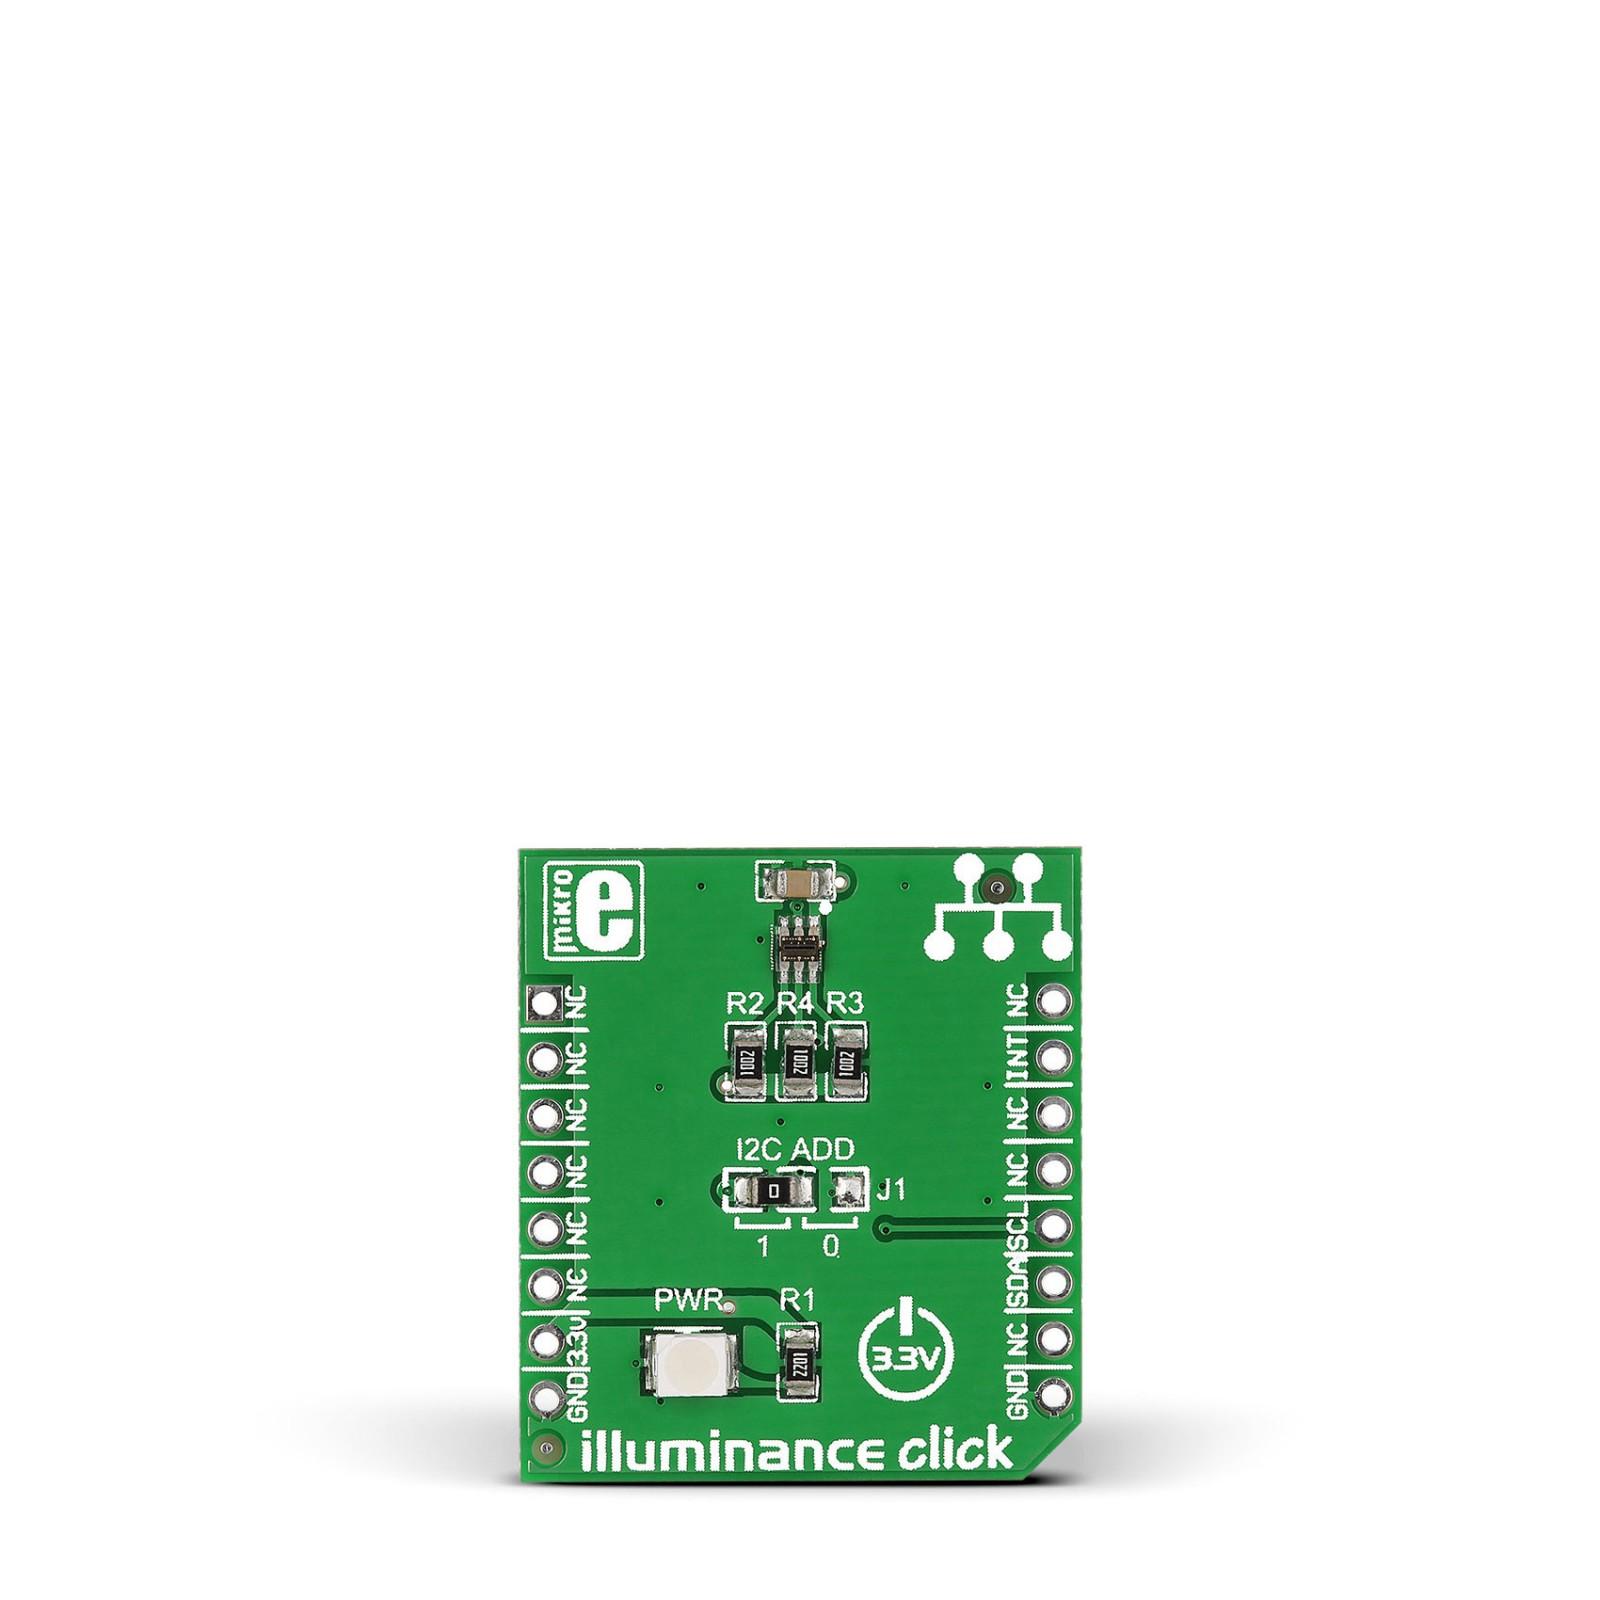 Illuminance Click Tsl2561 Light To Digital Converter With A Sensor Copyright Of This Circuit Belongs Smart Kit Electronics In Mgctlbxnmzp Mgctlbxv5112 Mgctlbxlc Mgctlbxpprestashop